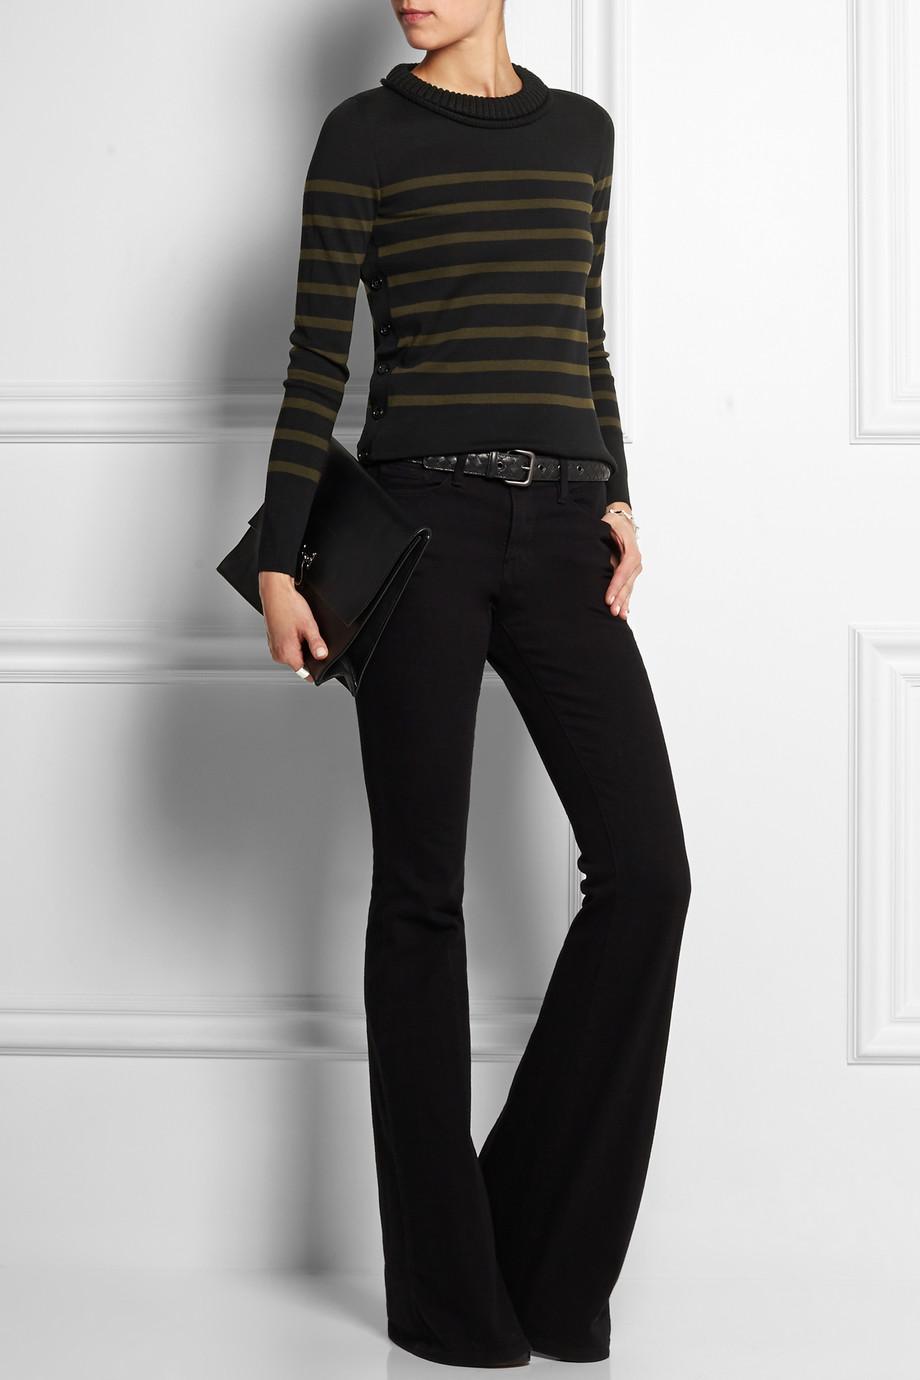 alexander mcqueen knitwear